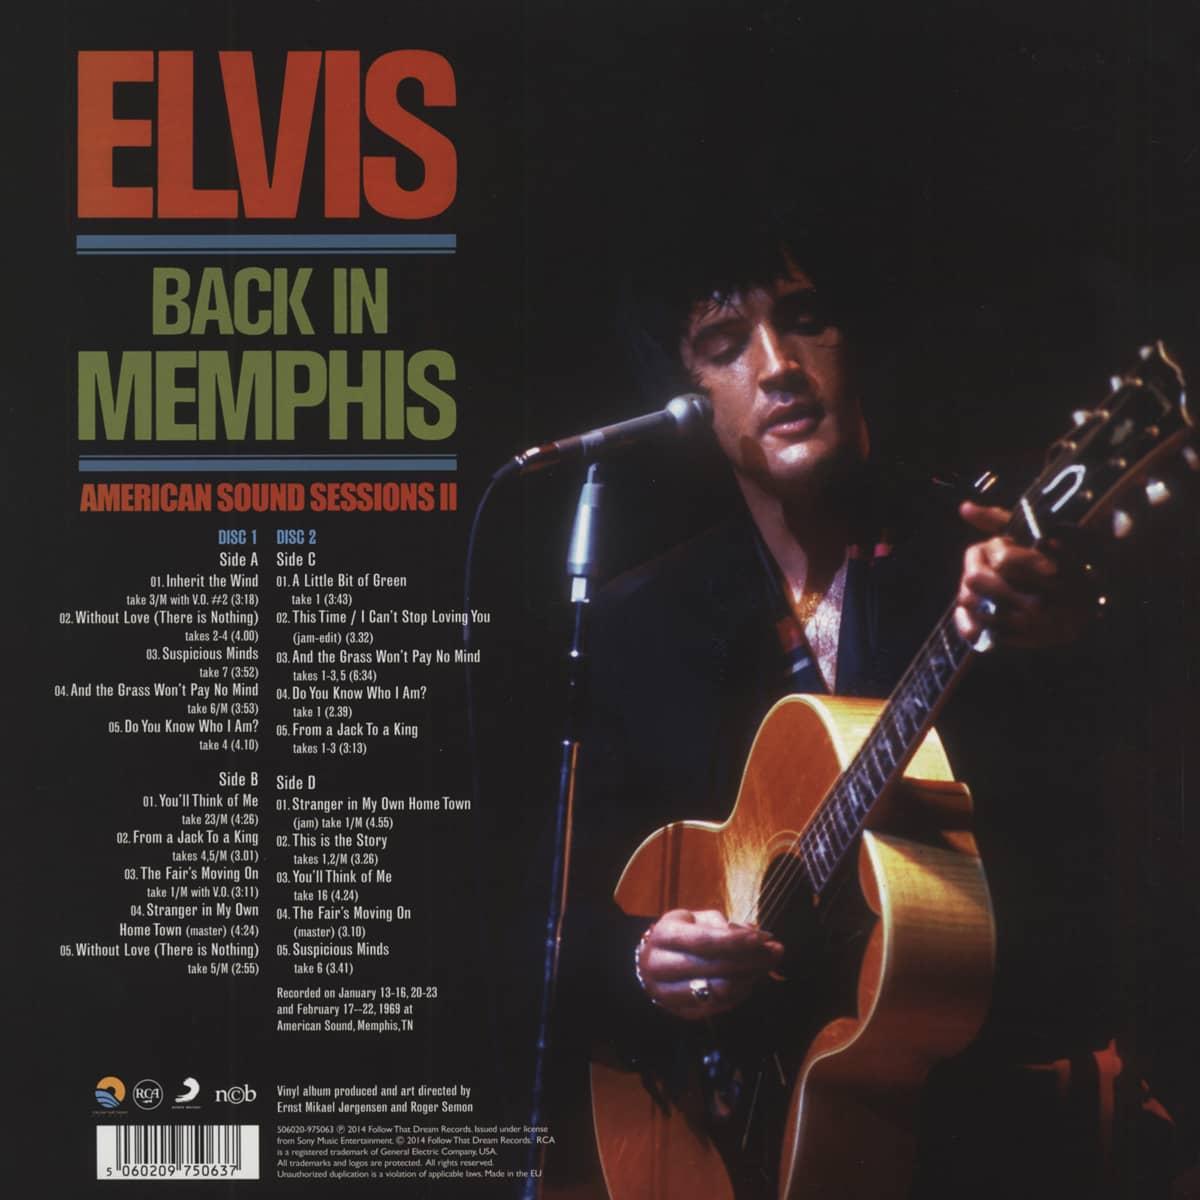 Elvis Presley Back In Memphis - American Sound Sessions II (2x180g Vinyl)